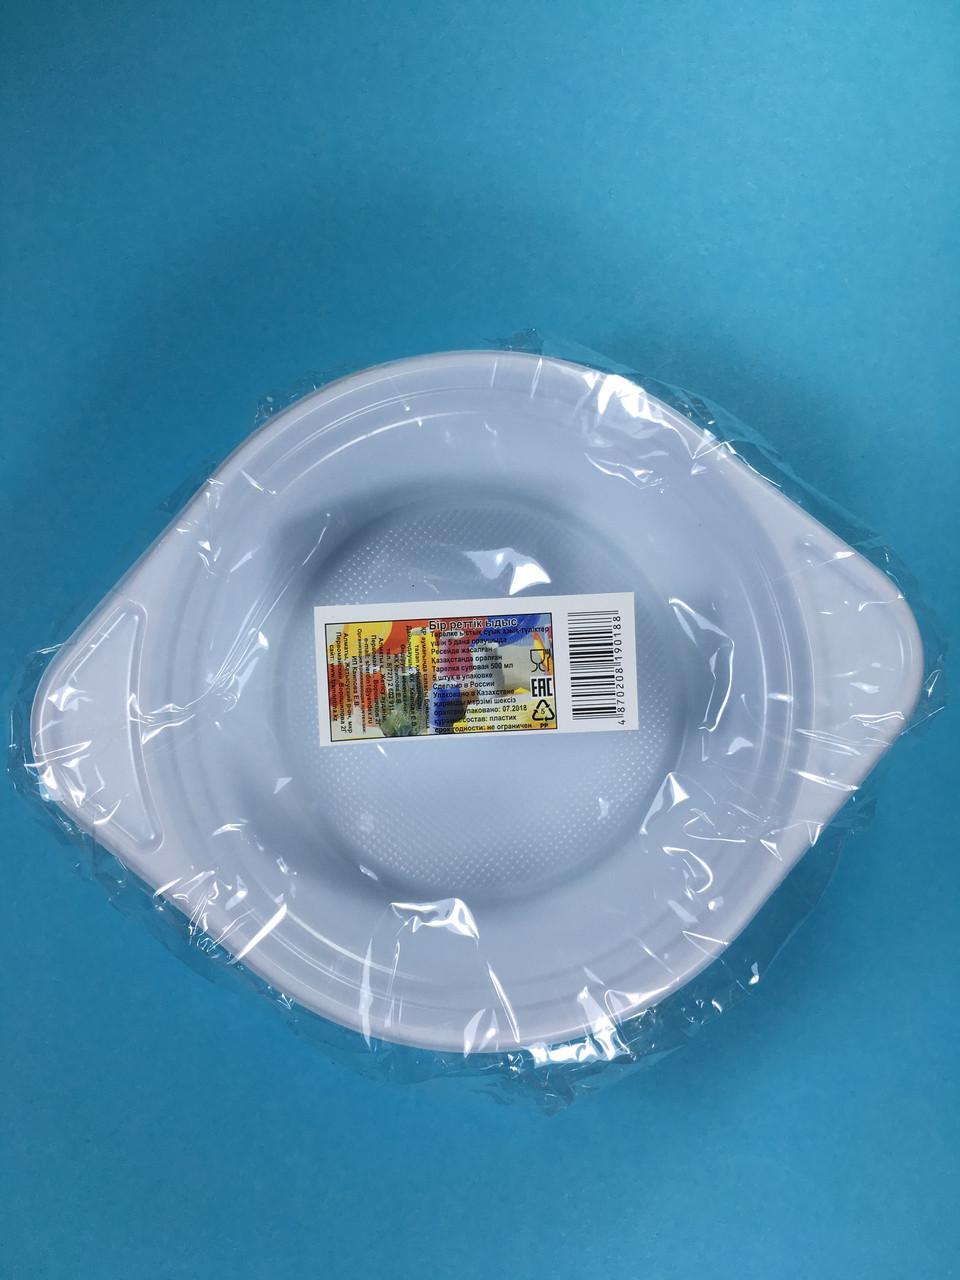 Тарелка одноразовая белая 500 мл (суповая) 5 шт/уп Sherdin